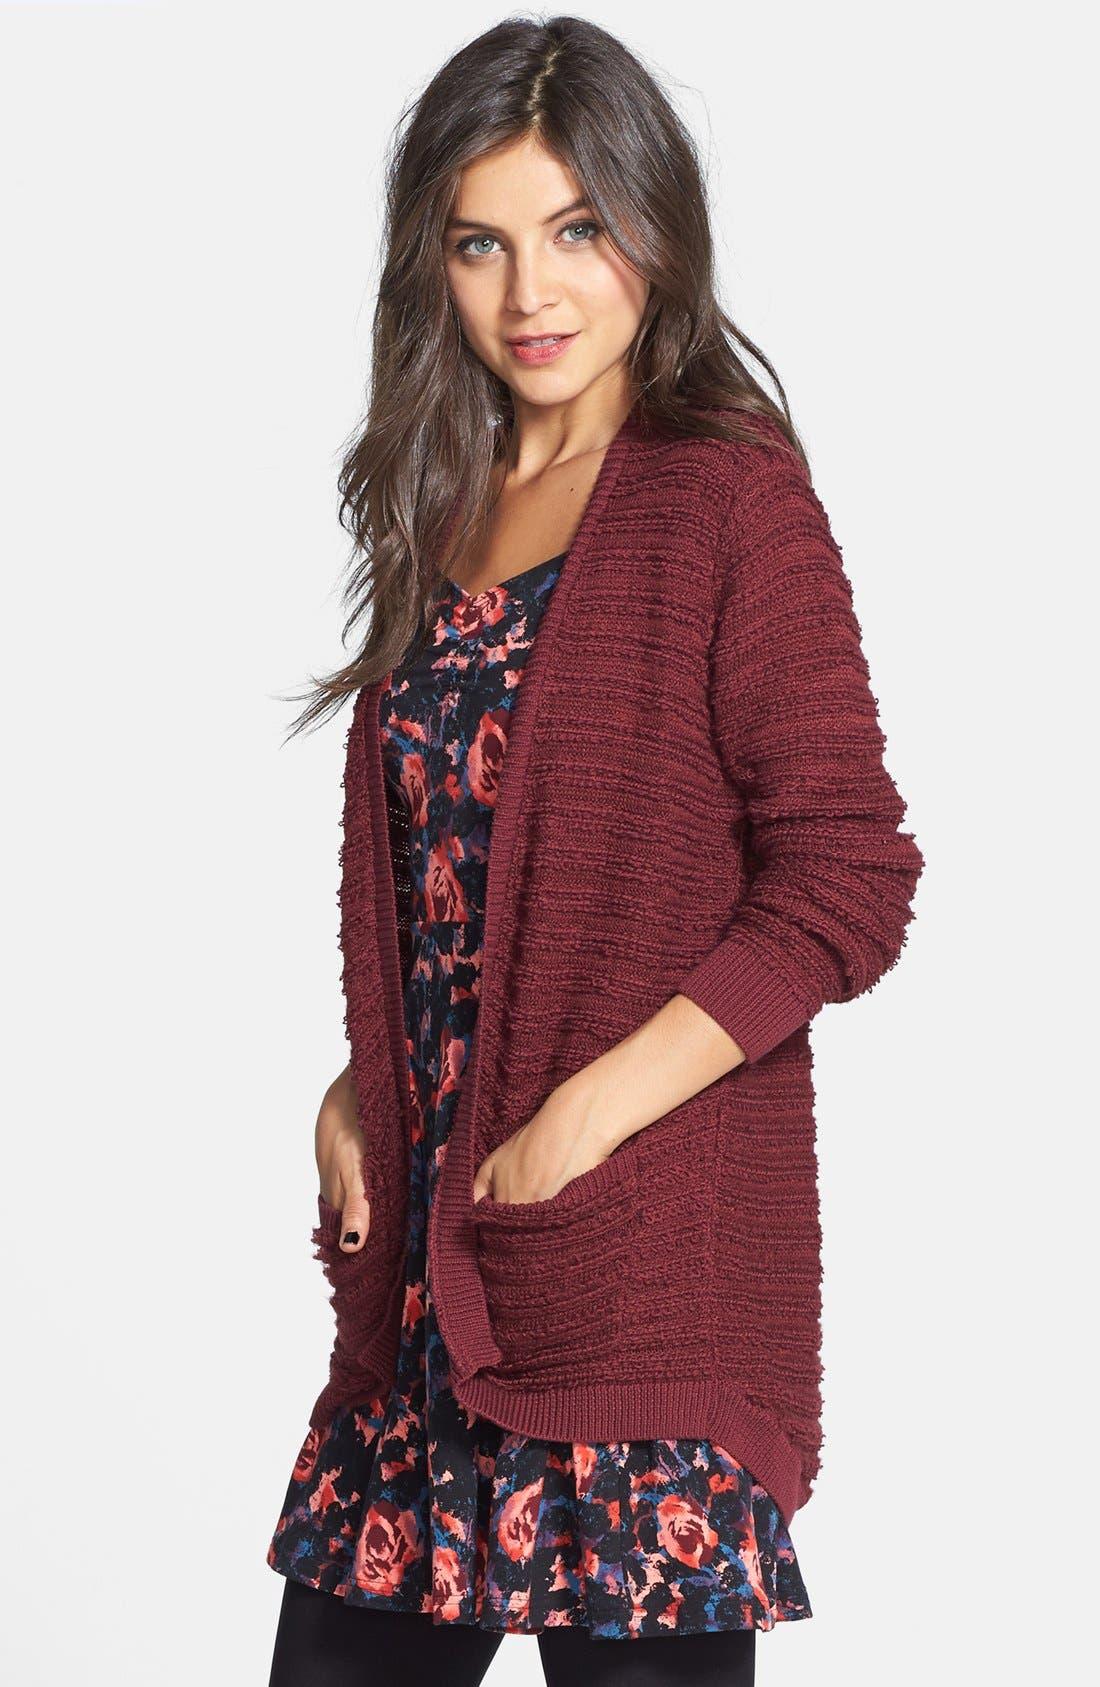 Alternate Image 1 Selected - BP. Stripe Knit Open Cardigan (Juniors) (Online Only)